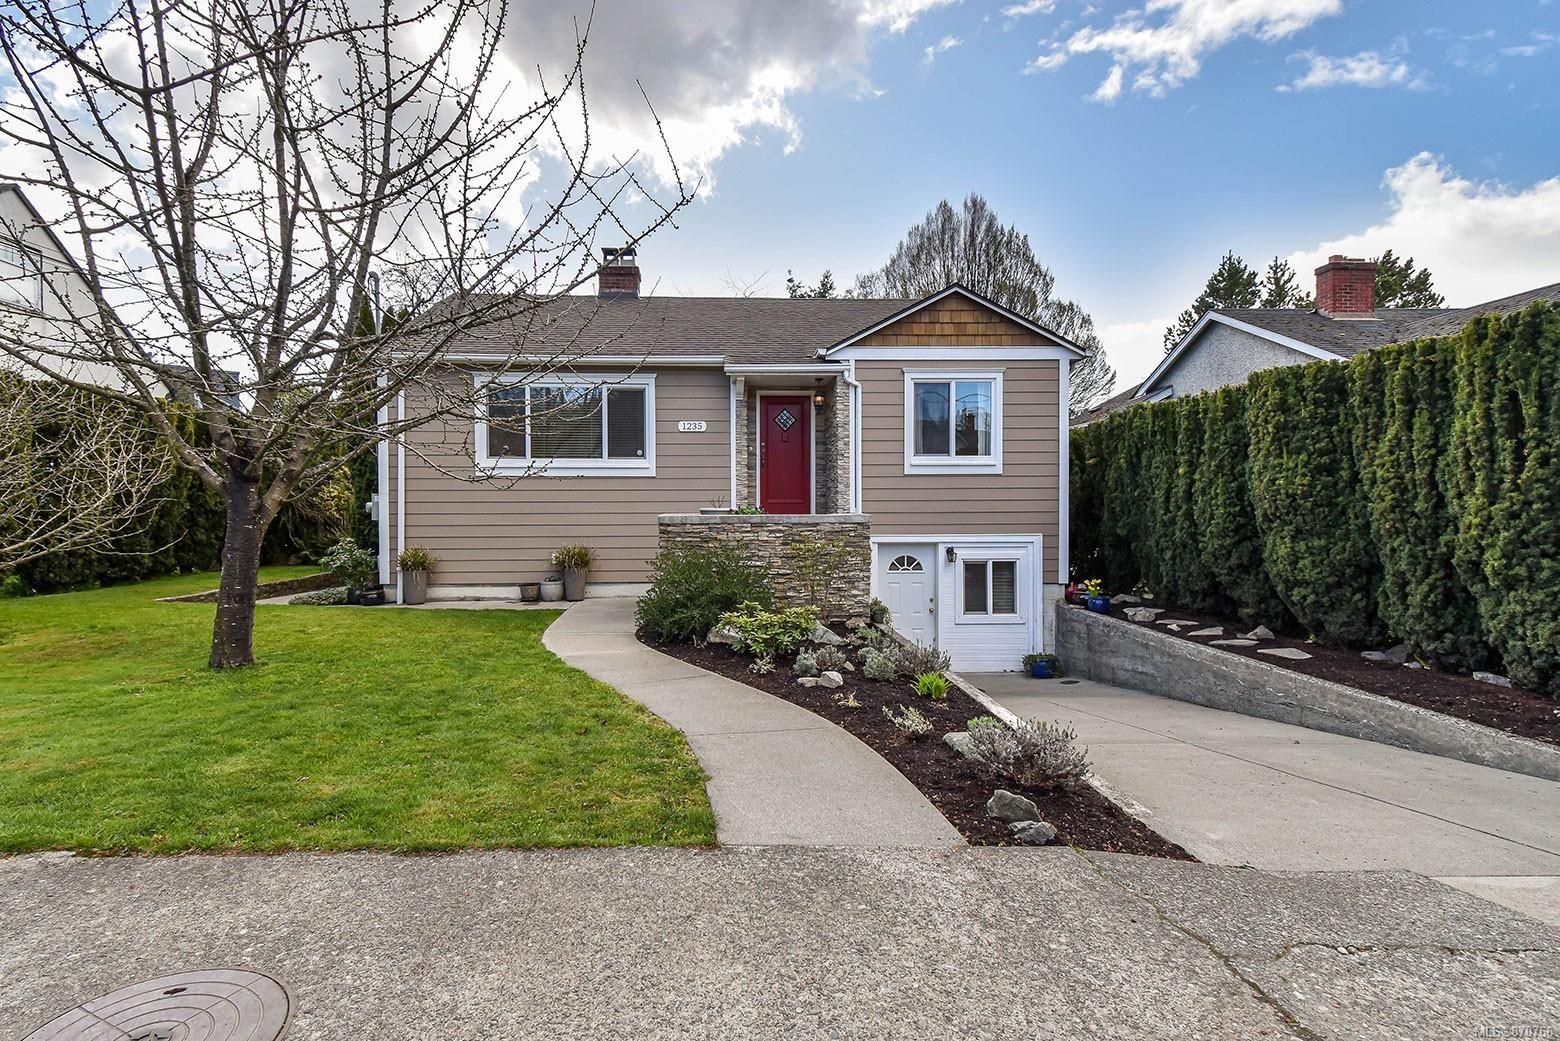 Main Photo: 1235 Basil Ave in : Vi Hillside House for sale (Victoria)  : MLS®# 870766